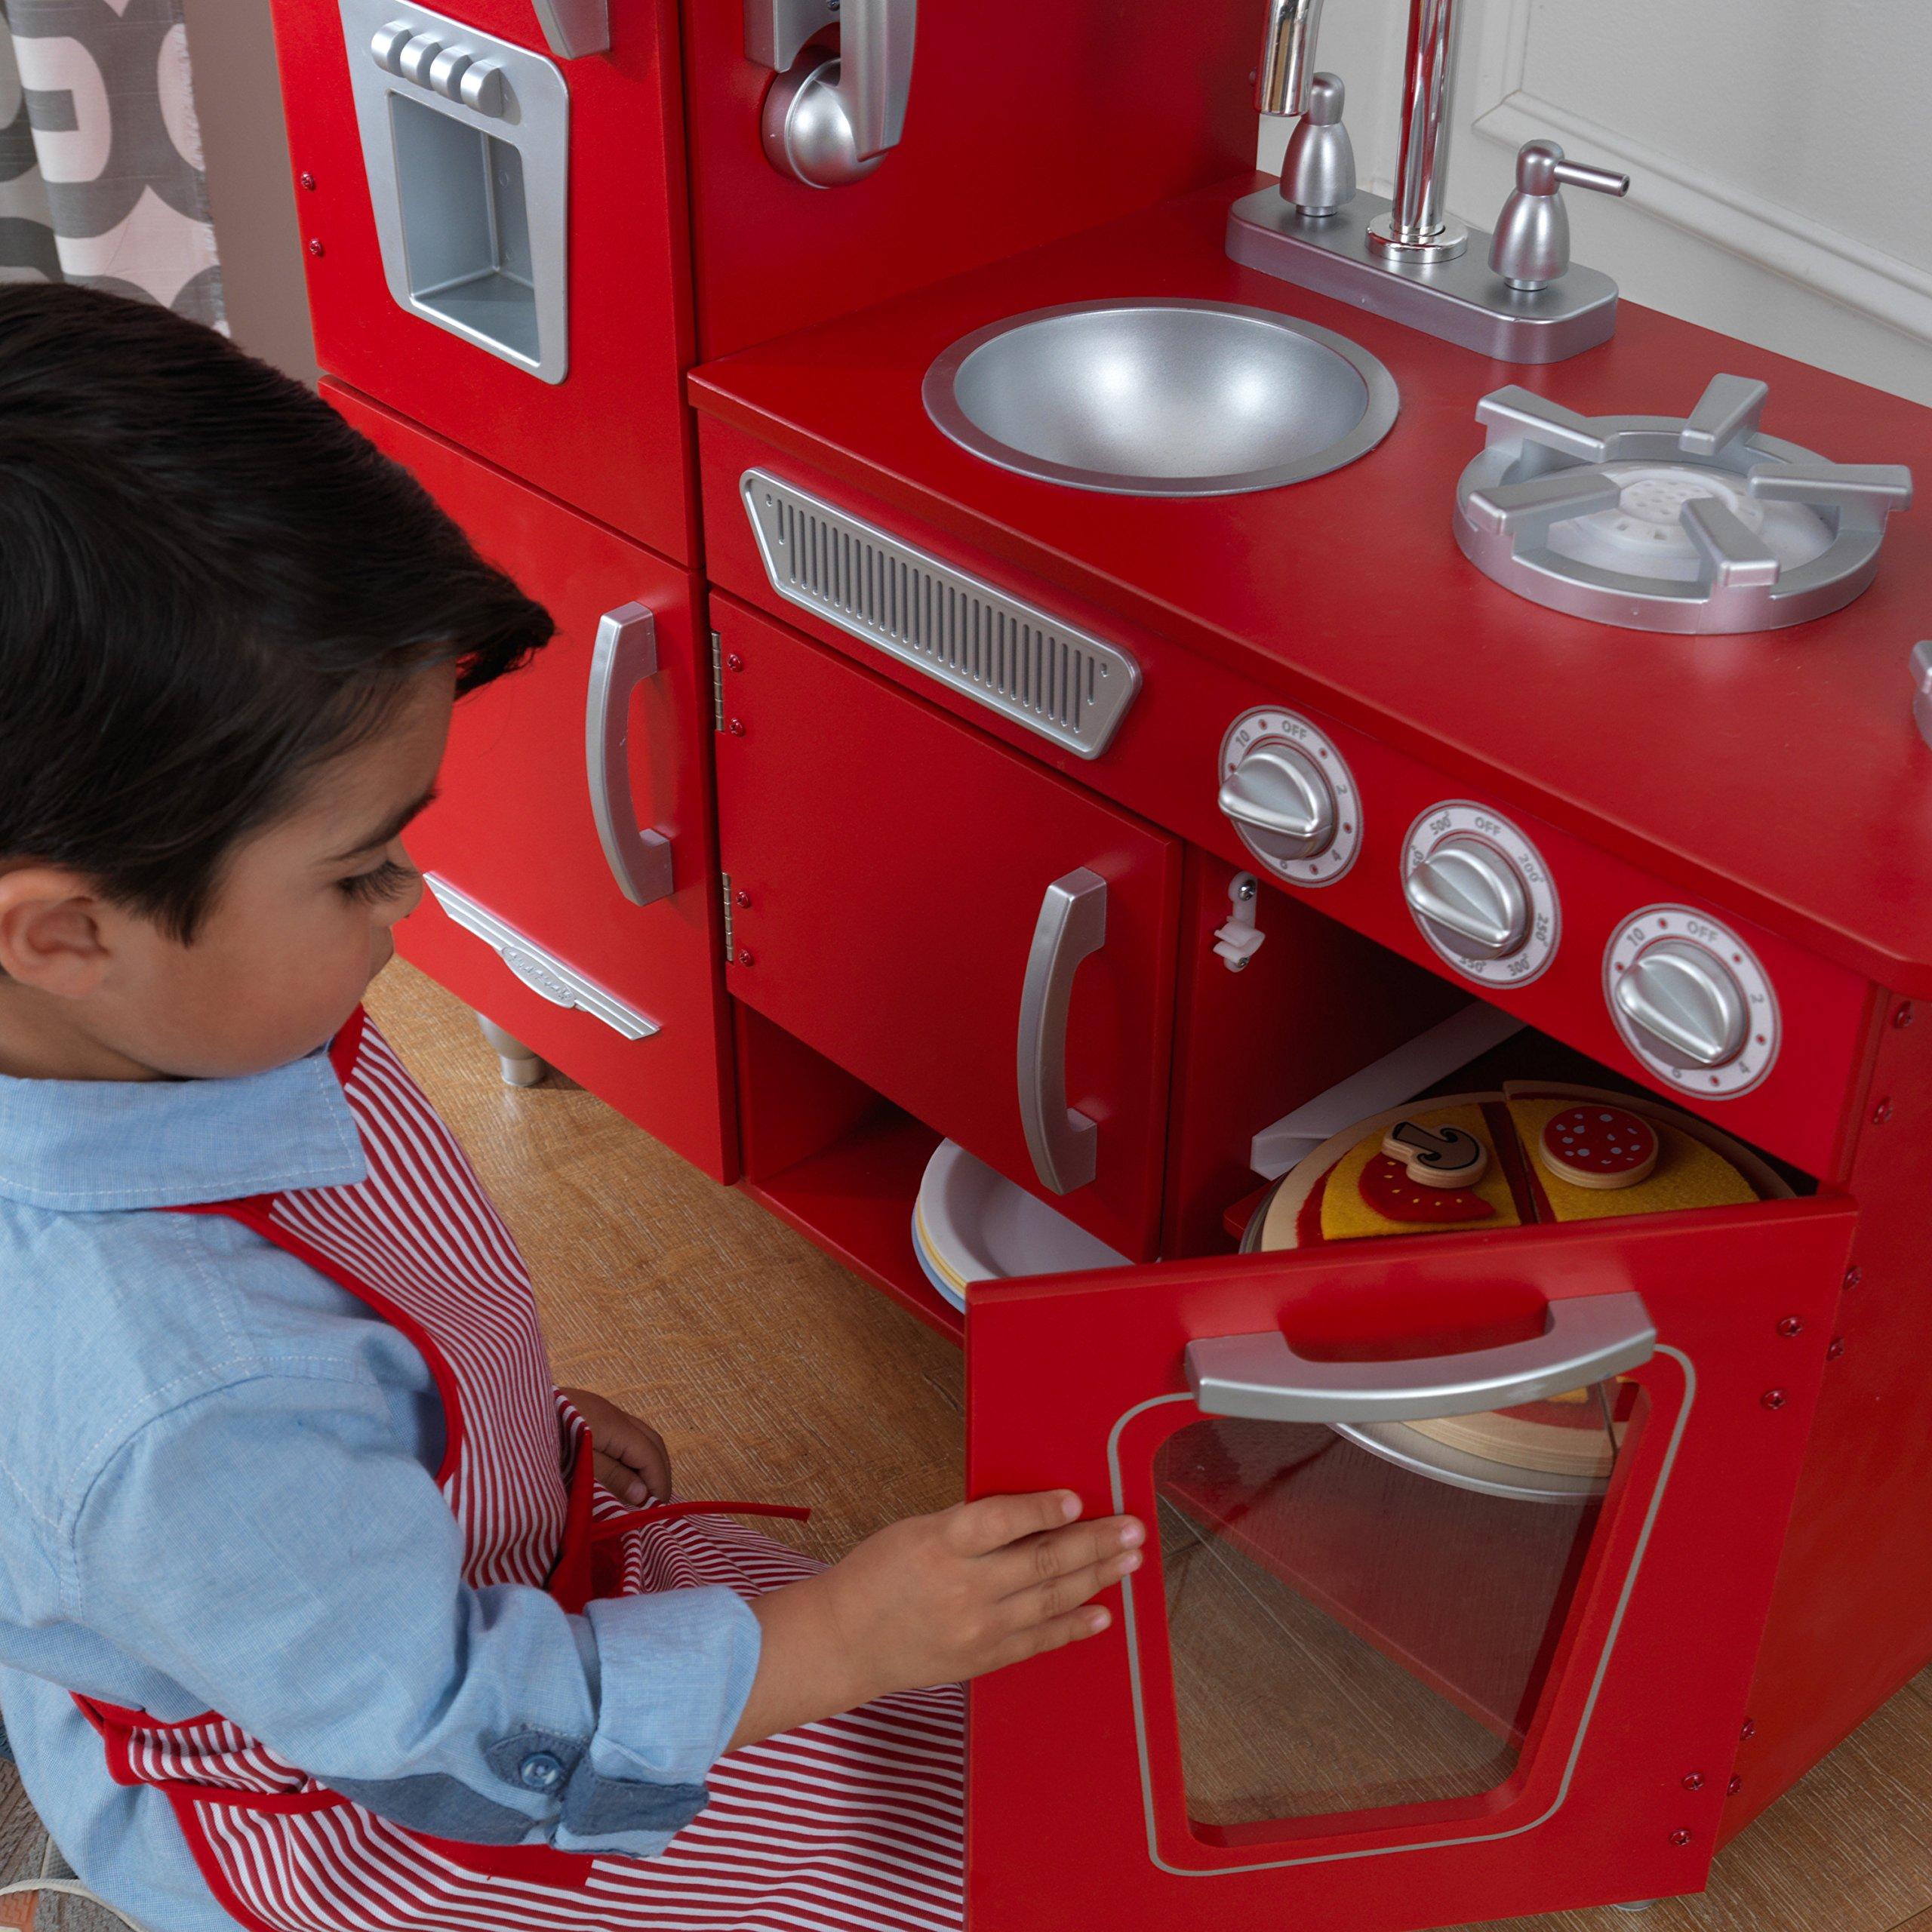 KidKraft Vintage Play Kitchen - Red by KidKraft (Image #12)